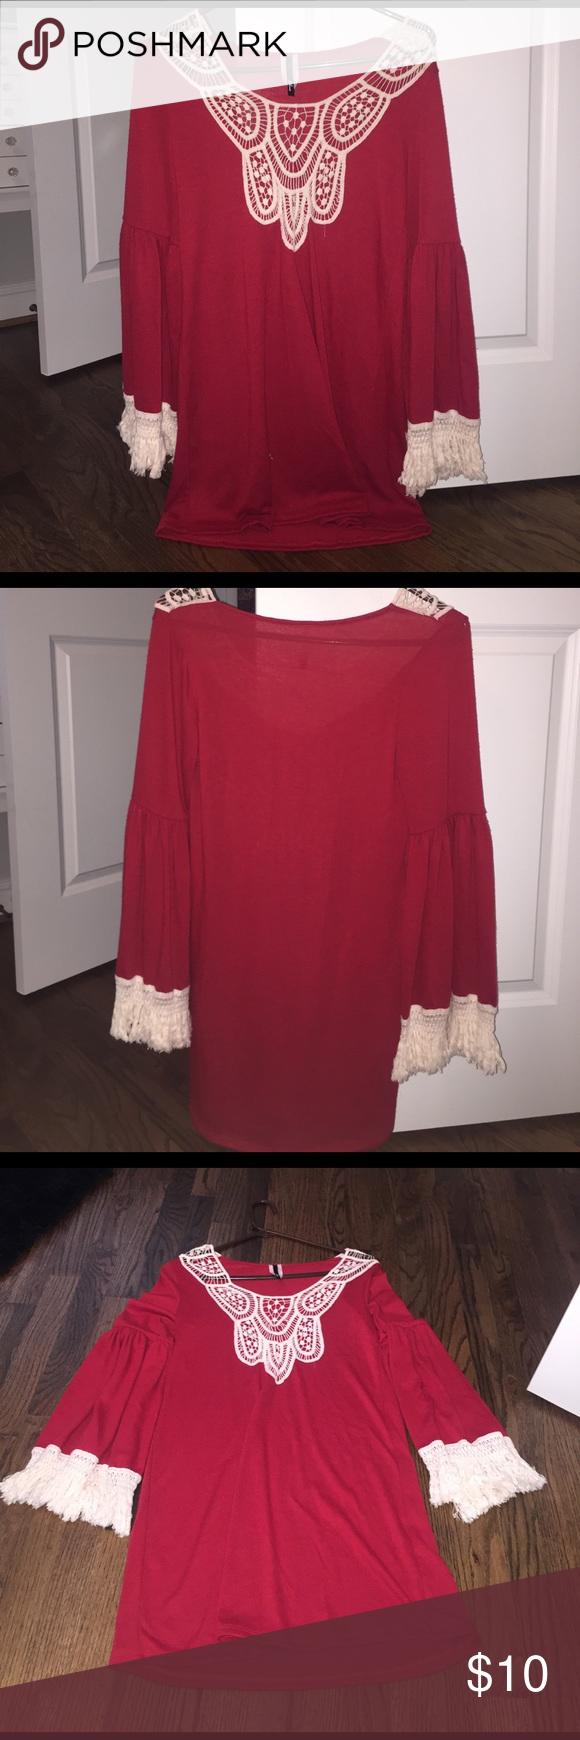 Red dress pinterest shoulder customer support and delivery